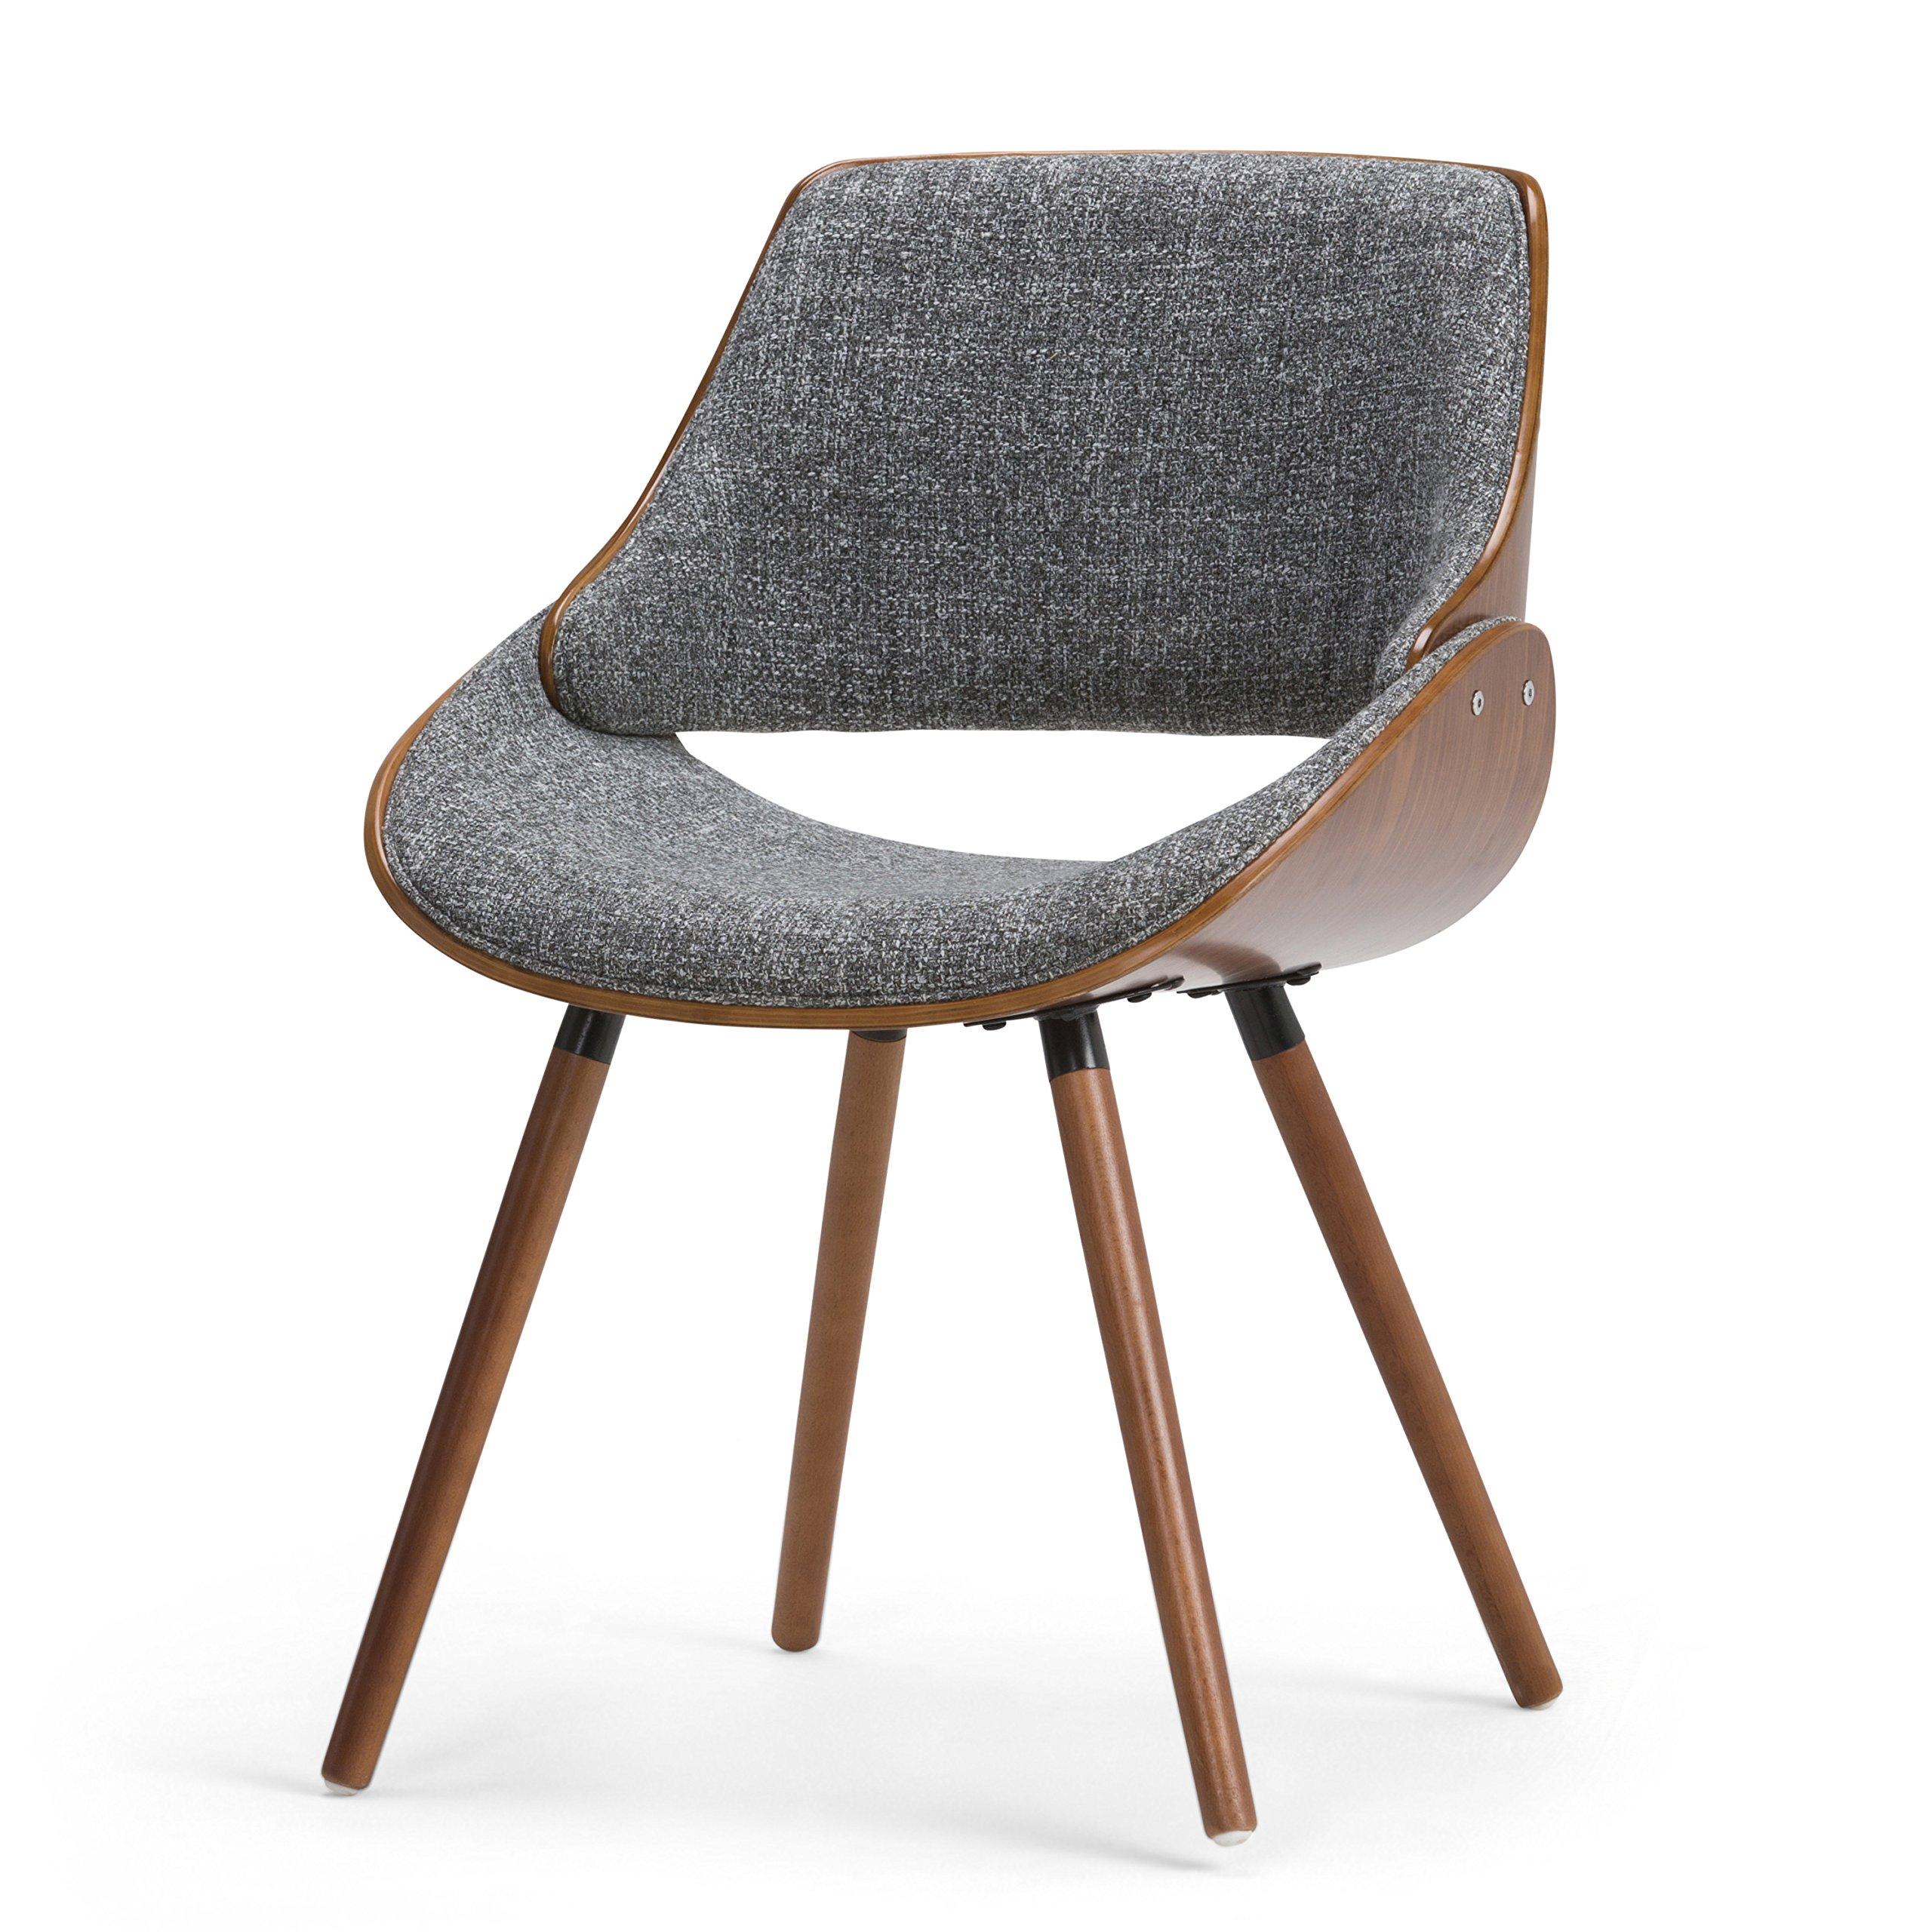 Cheap Thonet Bentwood Chair, Find Thonet Bentwood Chair Pertaining To Mia Bentwood Chairs (#4 of 20)